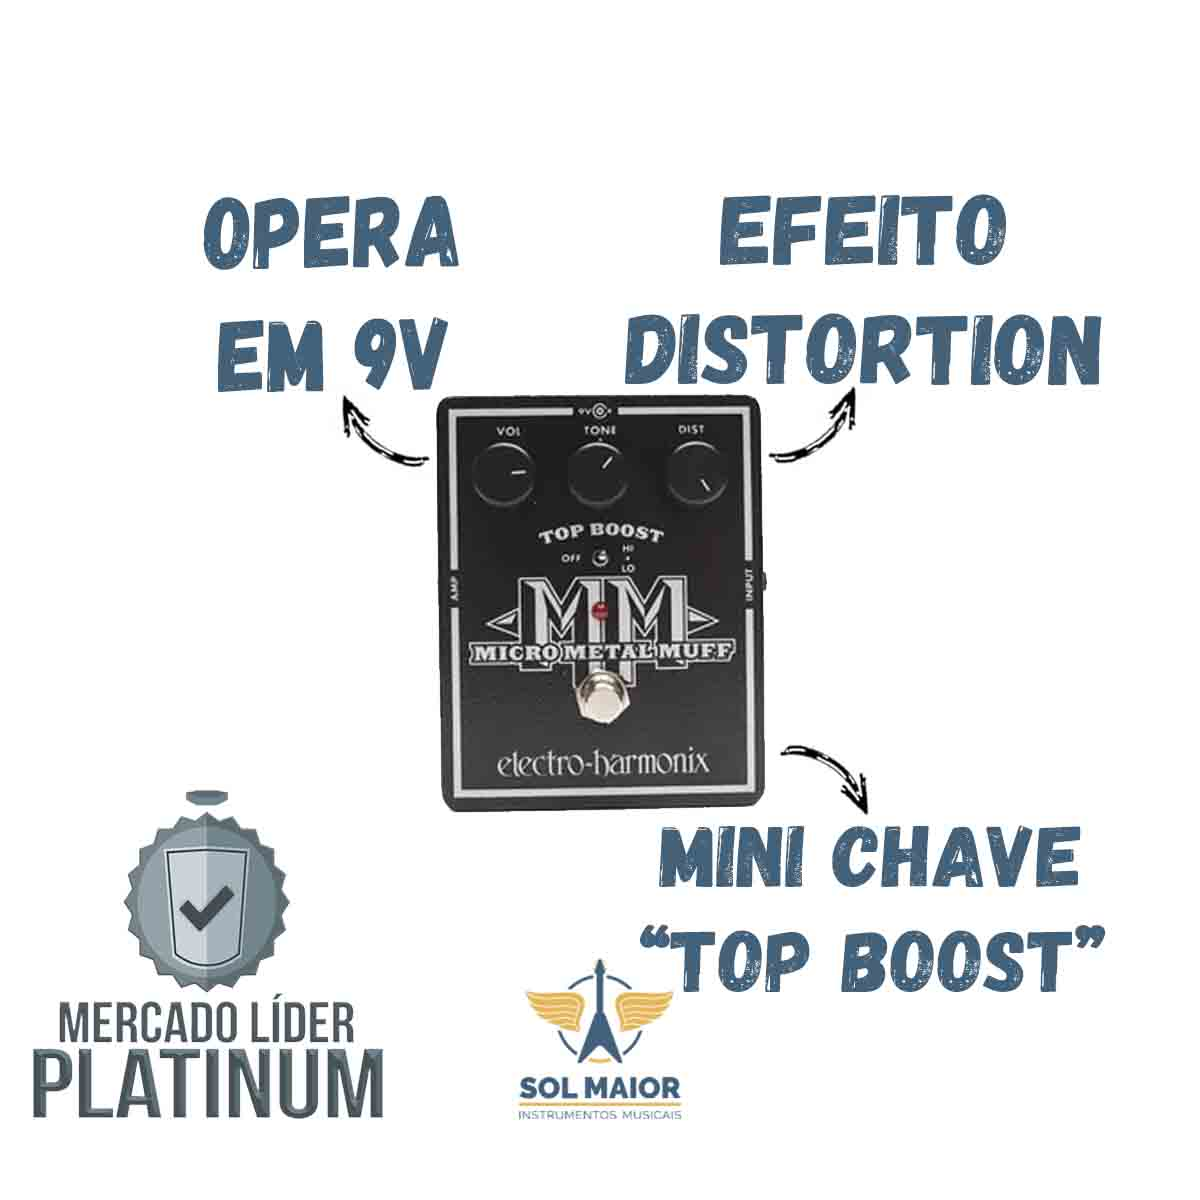 Pedal Electro-harmonix Micro Metal Muff Distortion With Top Boost